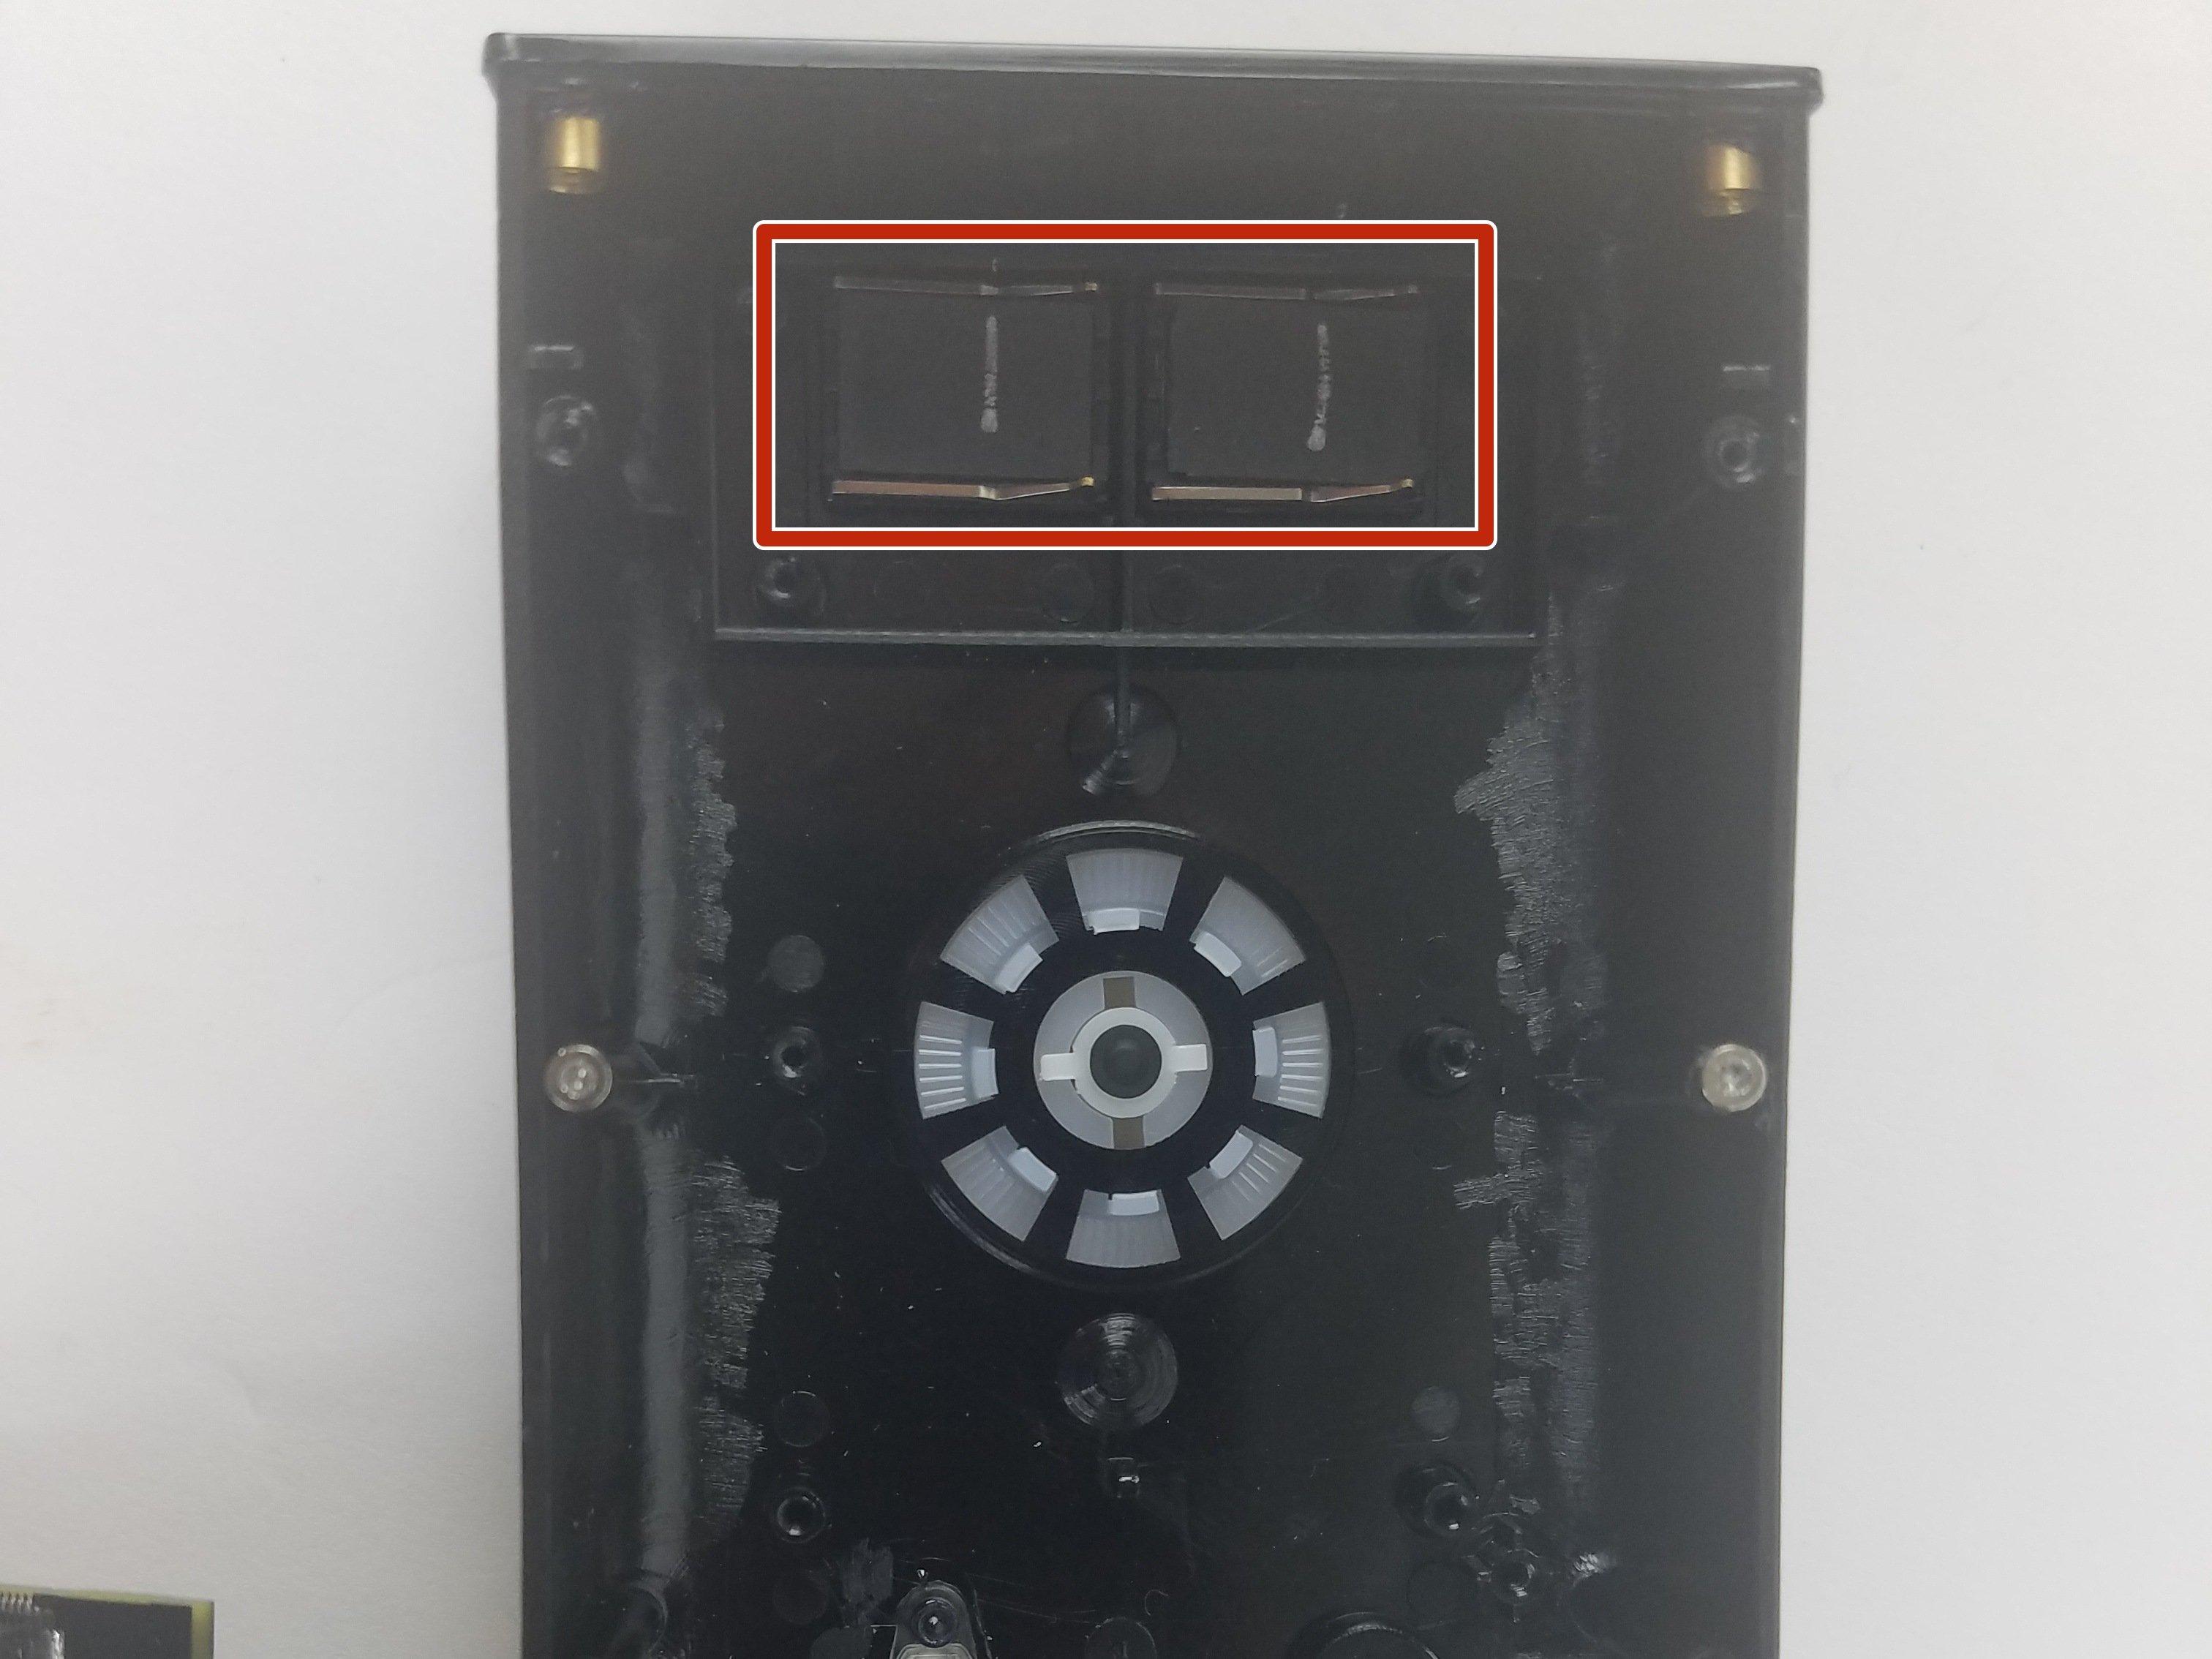 Ring Video Doorbell Speakers Replacement Ifixit Repair Guide